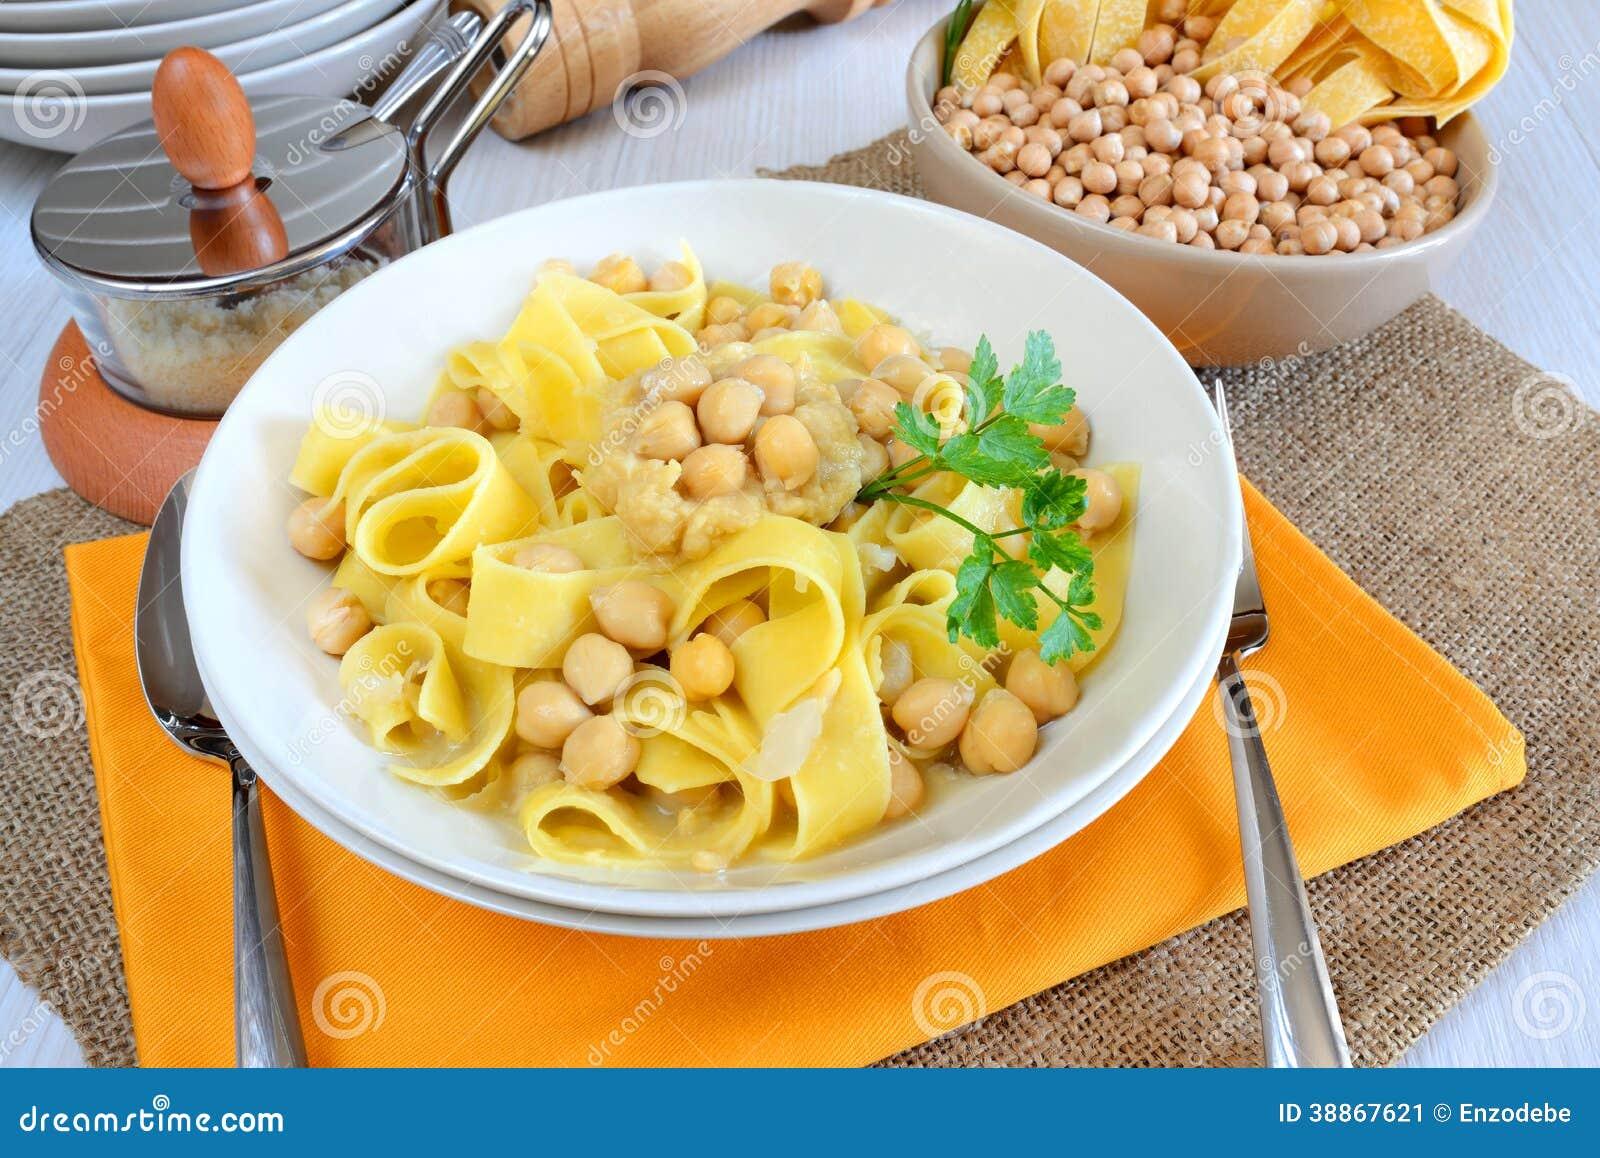 Homemade italian tagliatelle pasta with chickpeas cream.